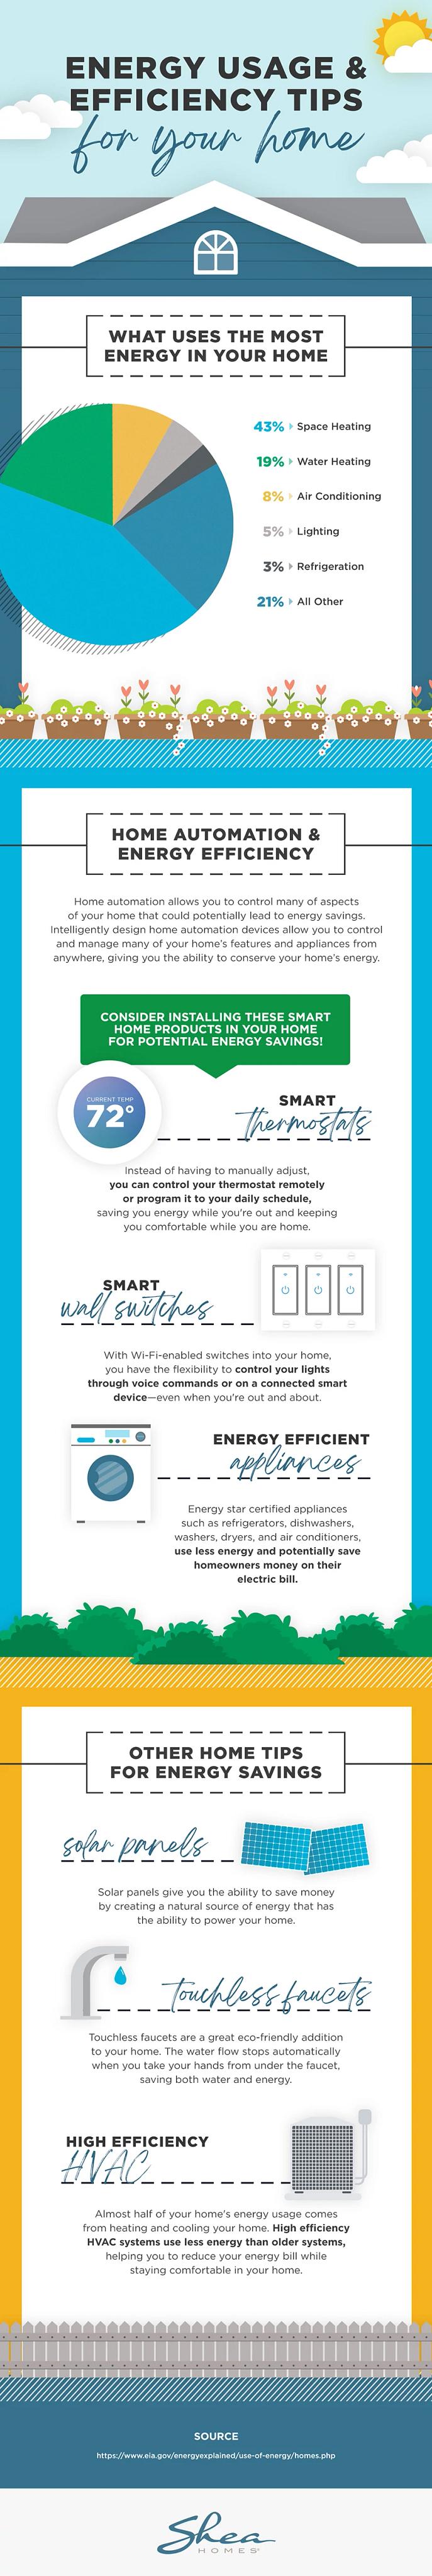 SHEA4366-EnergyEfficiency-Infographic-R2 copy.jpg